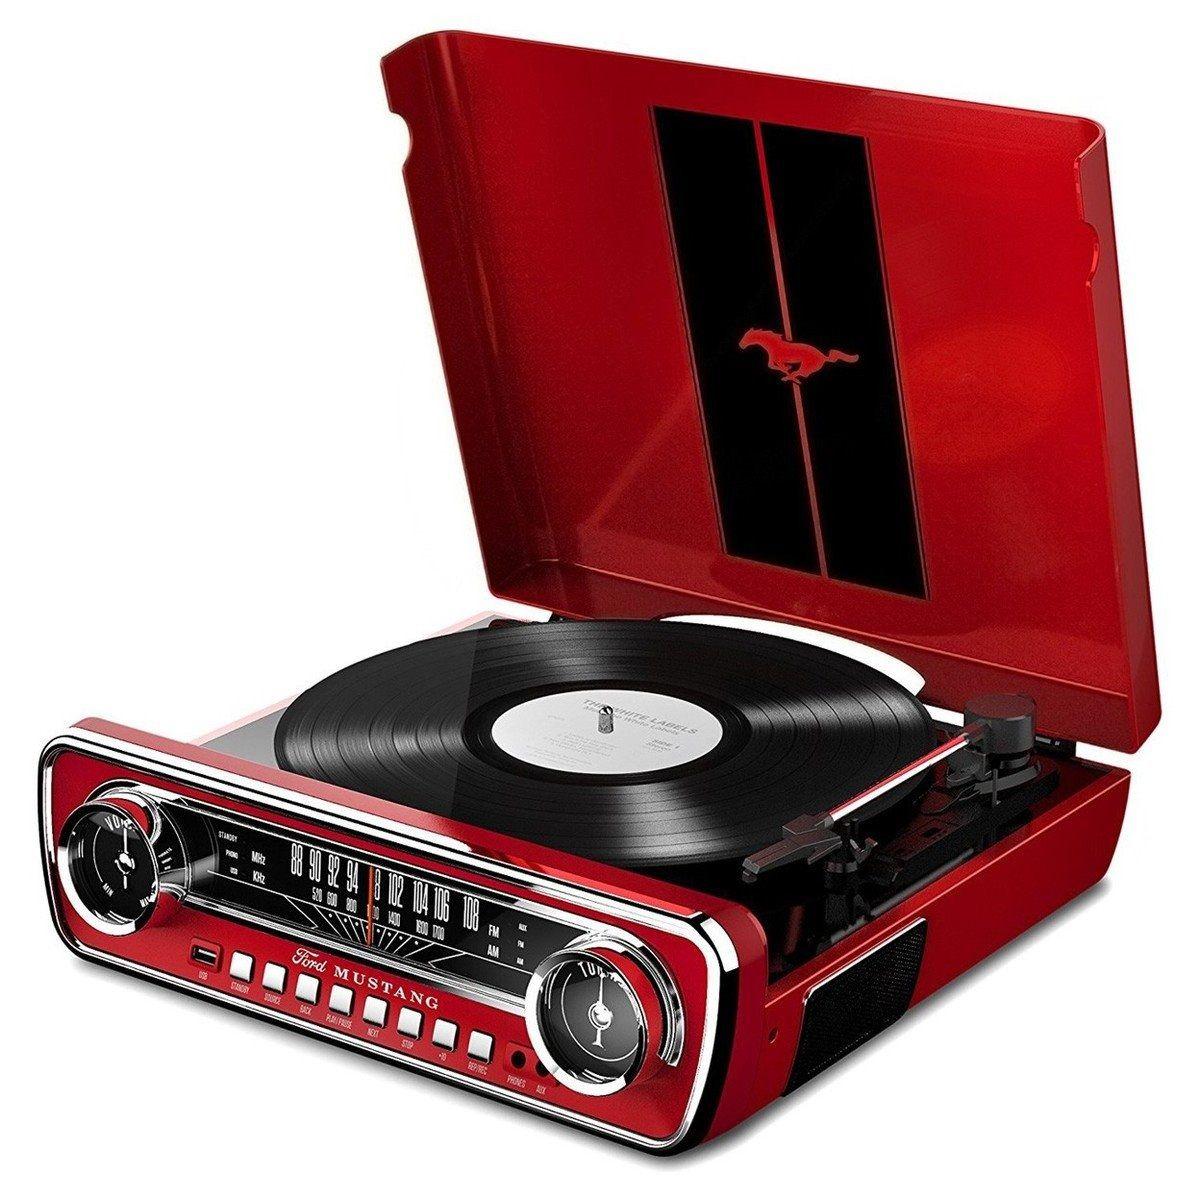 Toca Disco Usb Lp Mustang 4 Em 1 Radio Vintage Vitrola Vinil (MUSTANGLP)